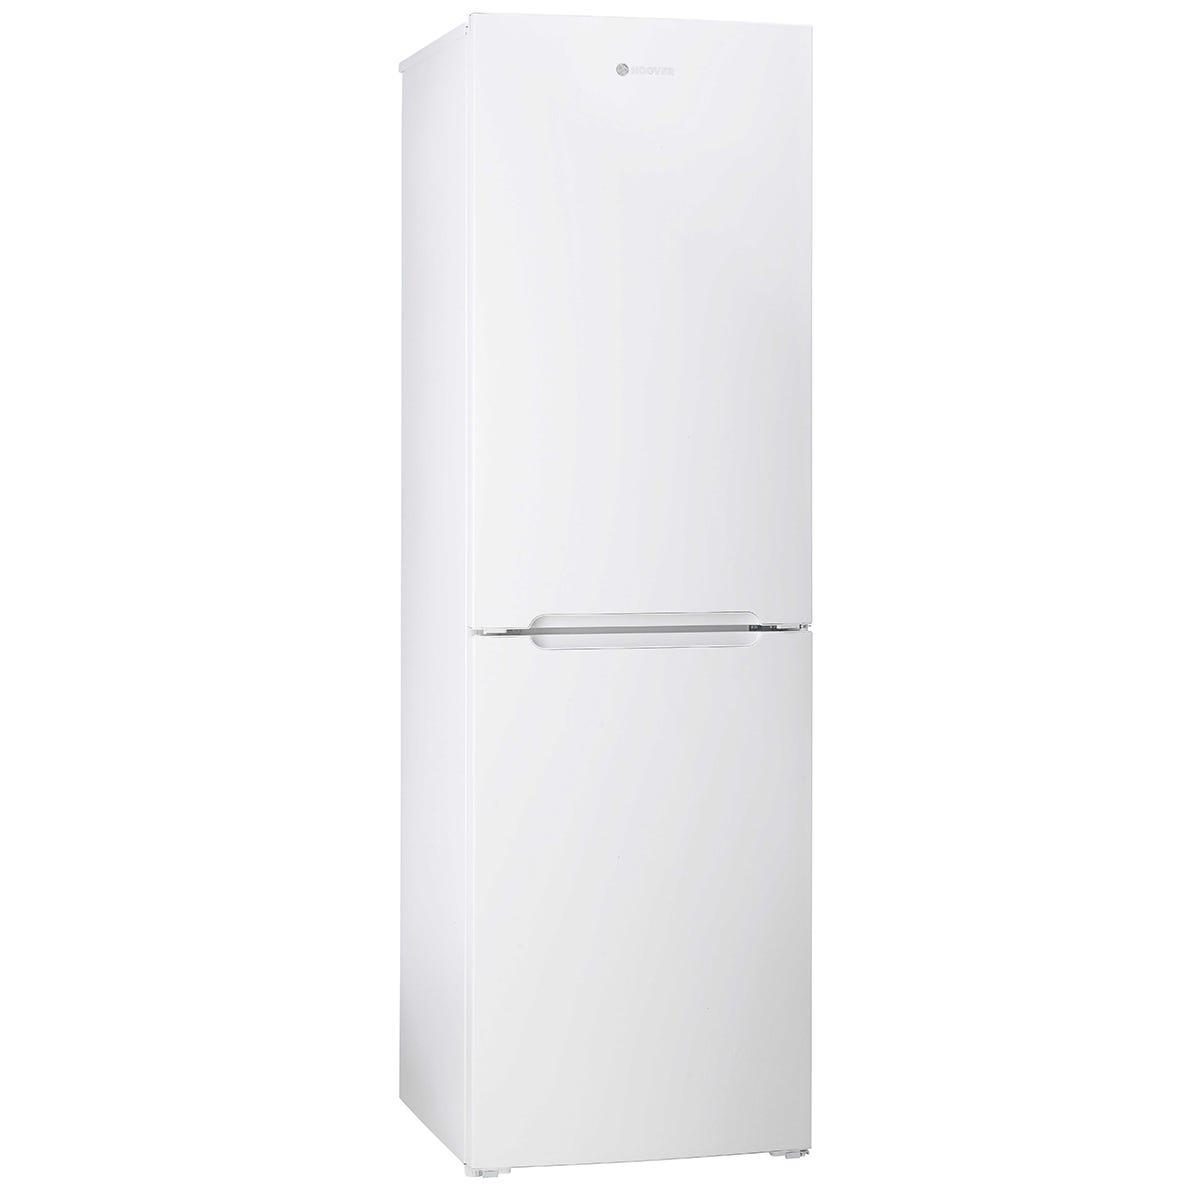 Hoover HCF5172WK Frost Free 242L 50/50 Fridge Freezer - White